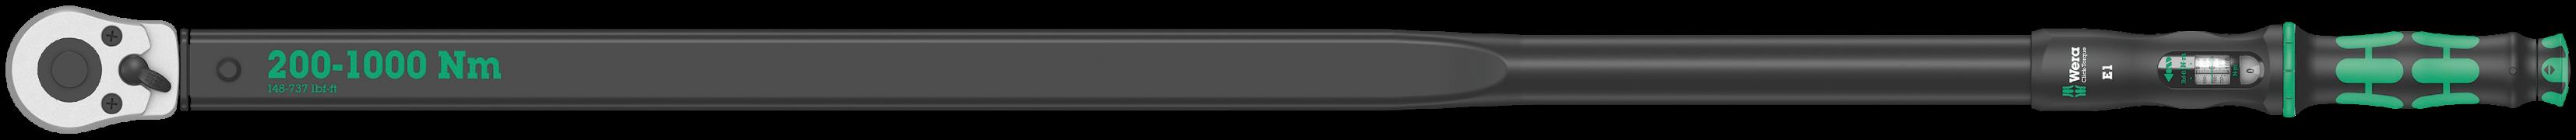 Clé dynamométrique à cliquet Click-Torque E1  - 05075630001 - Wera Tools